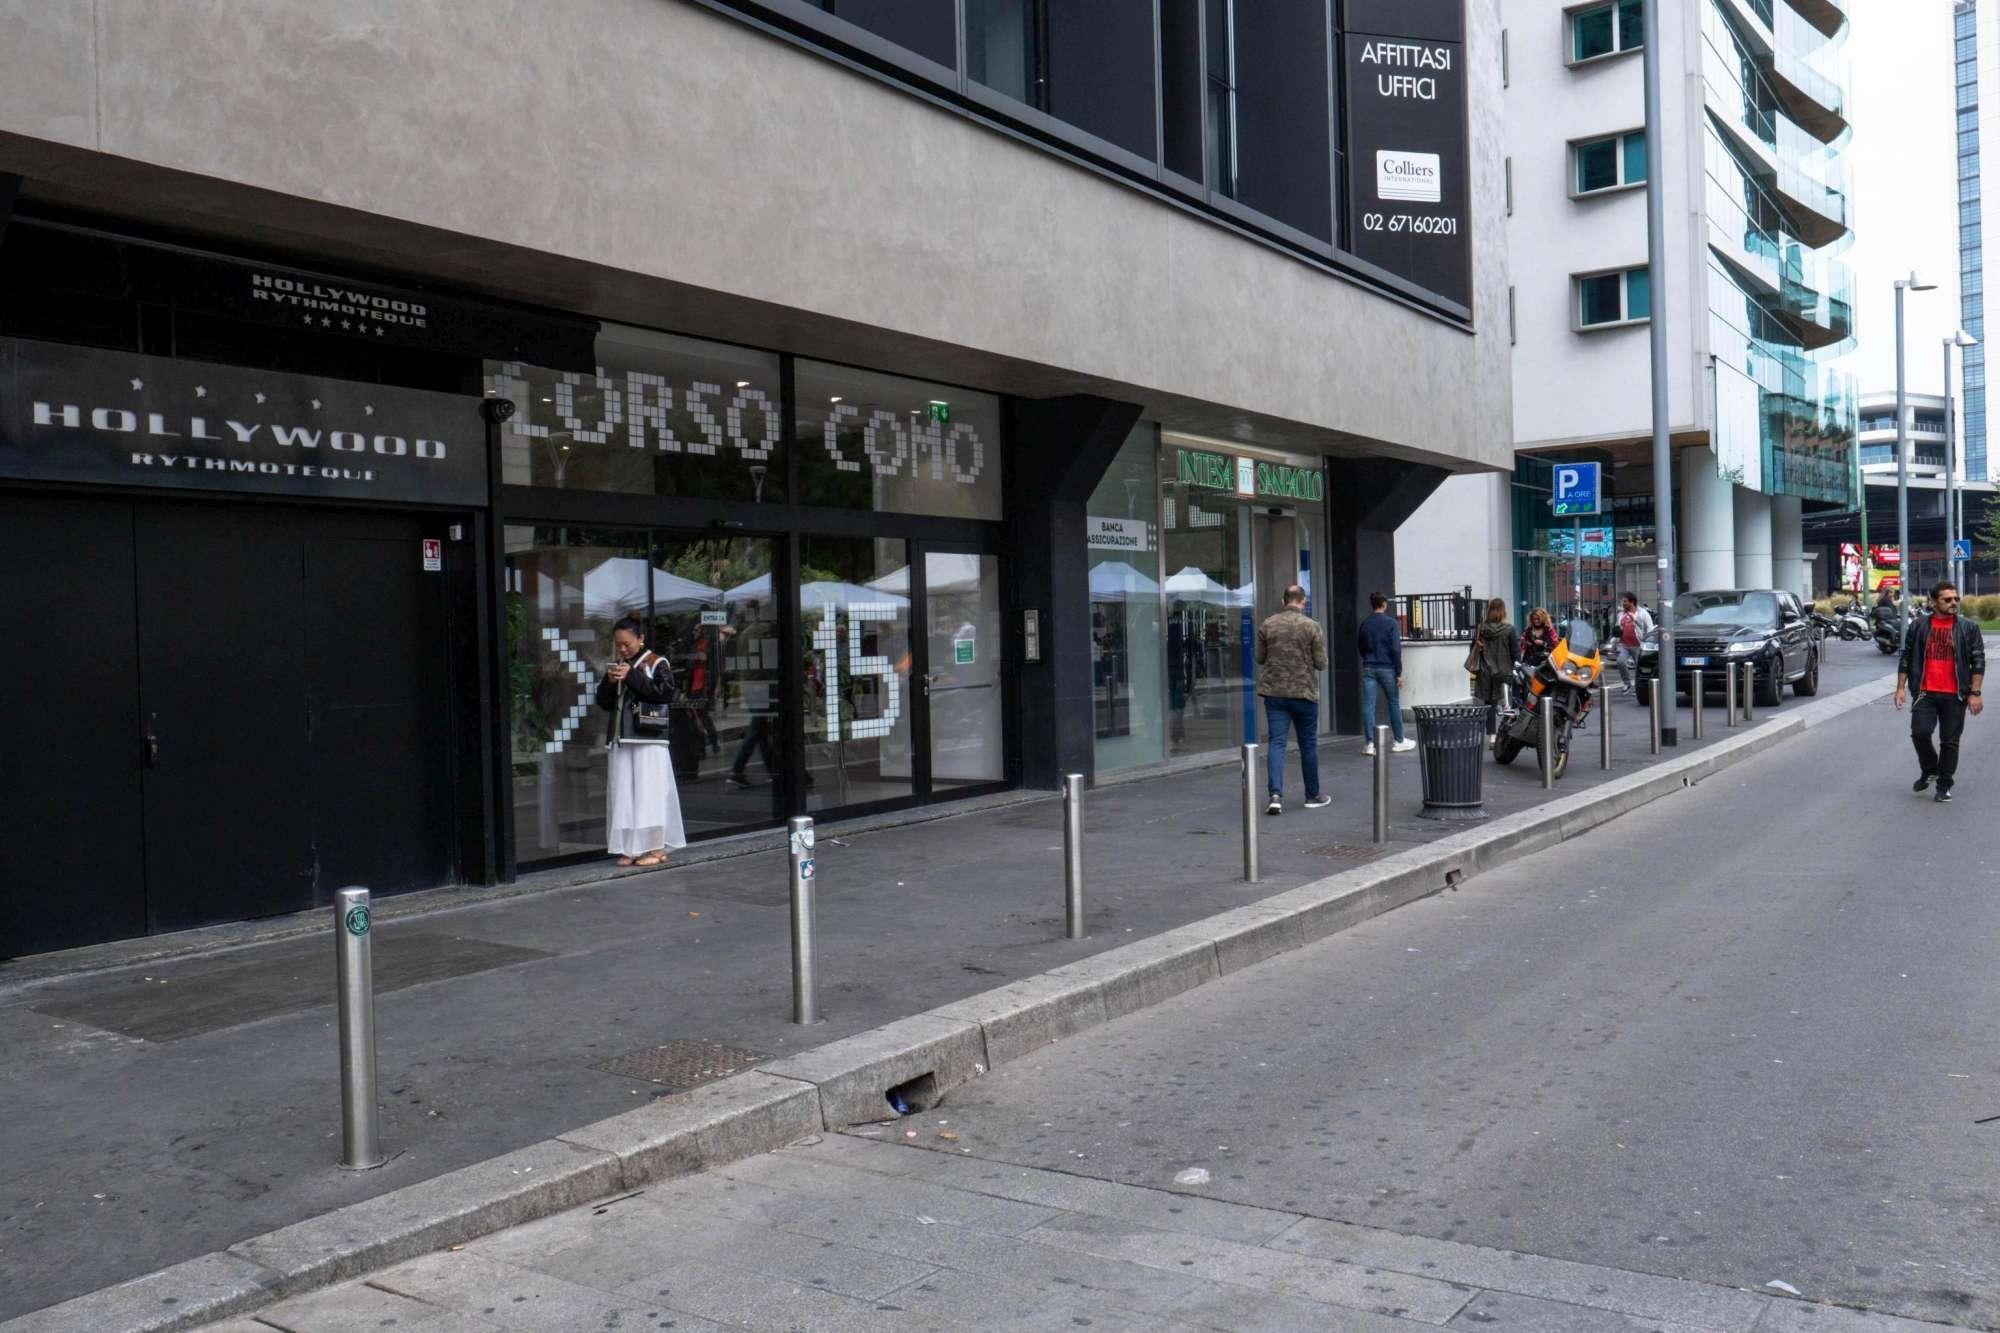 Milano, spray urticante crea panico in discoteca